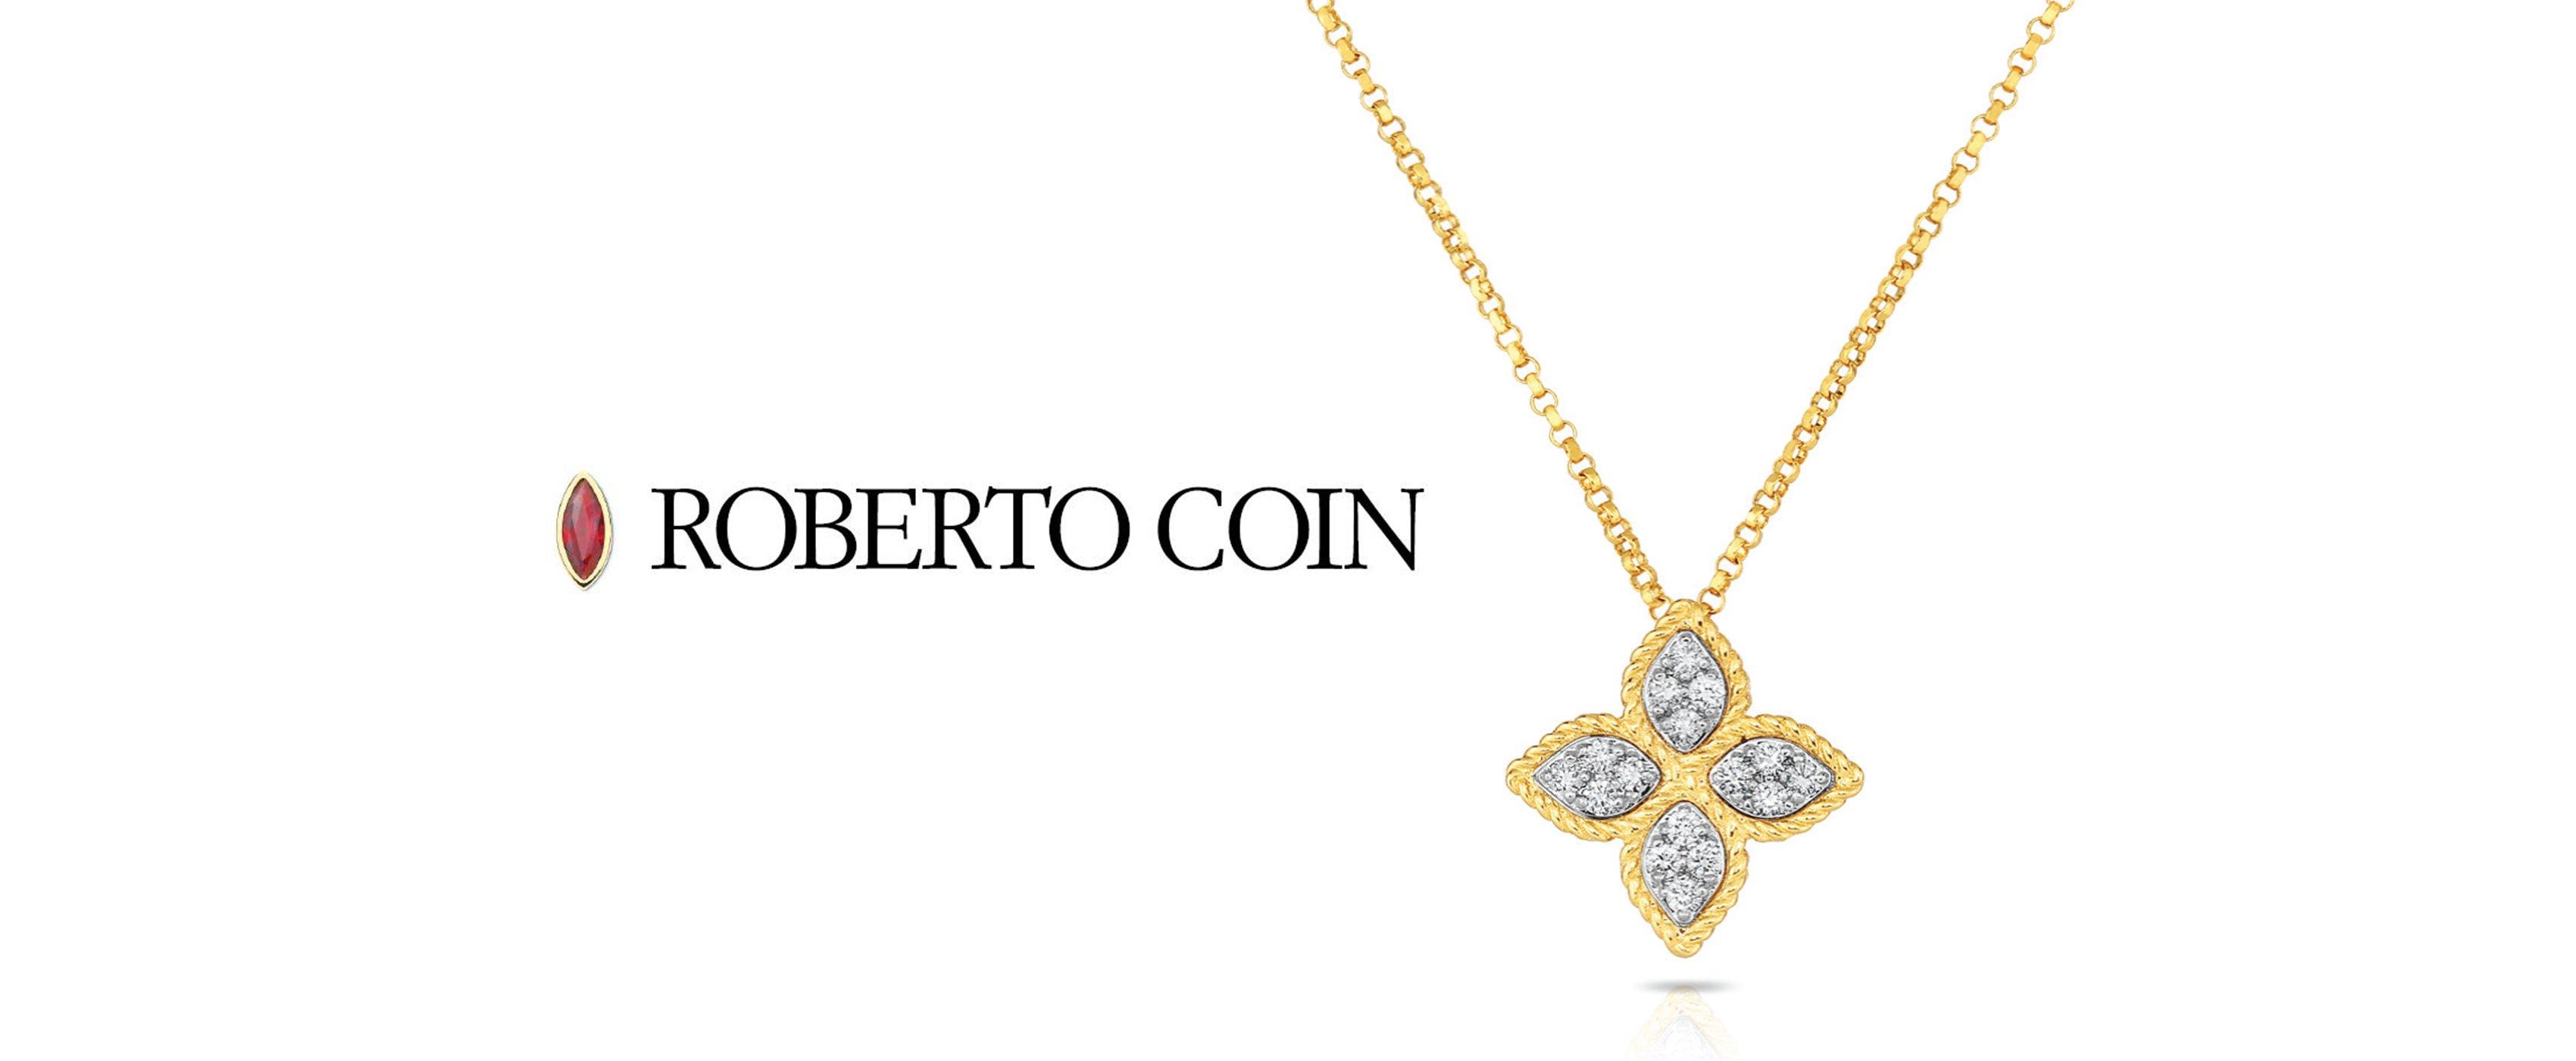 Roberto Coin Jewelry Marin, CA